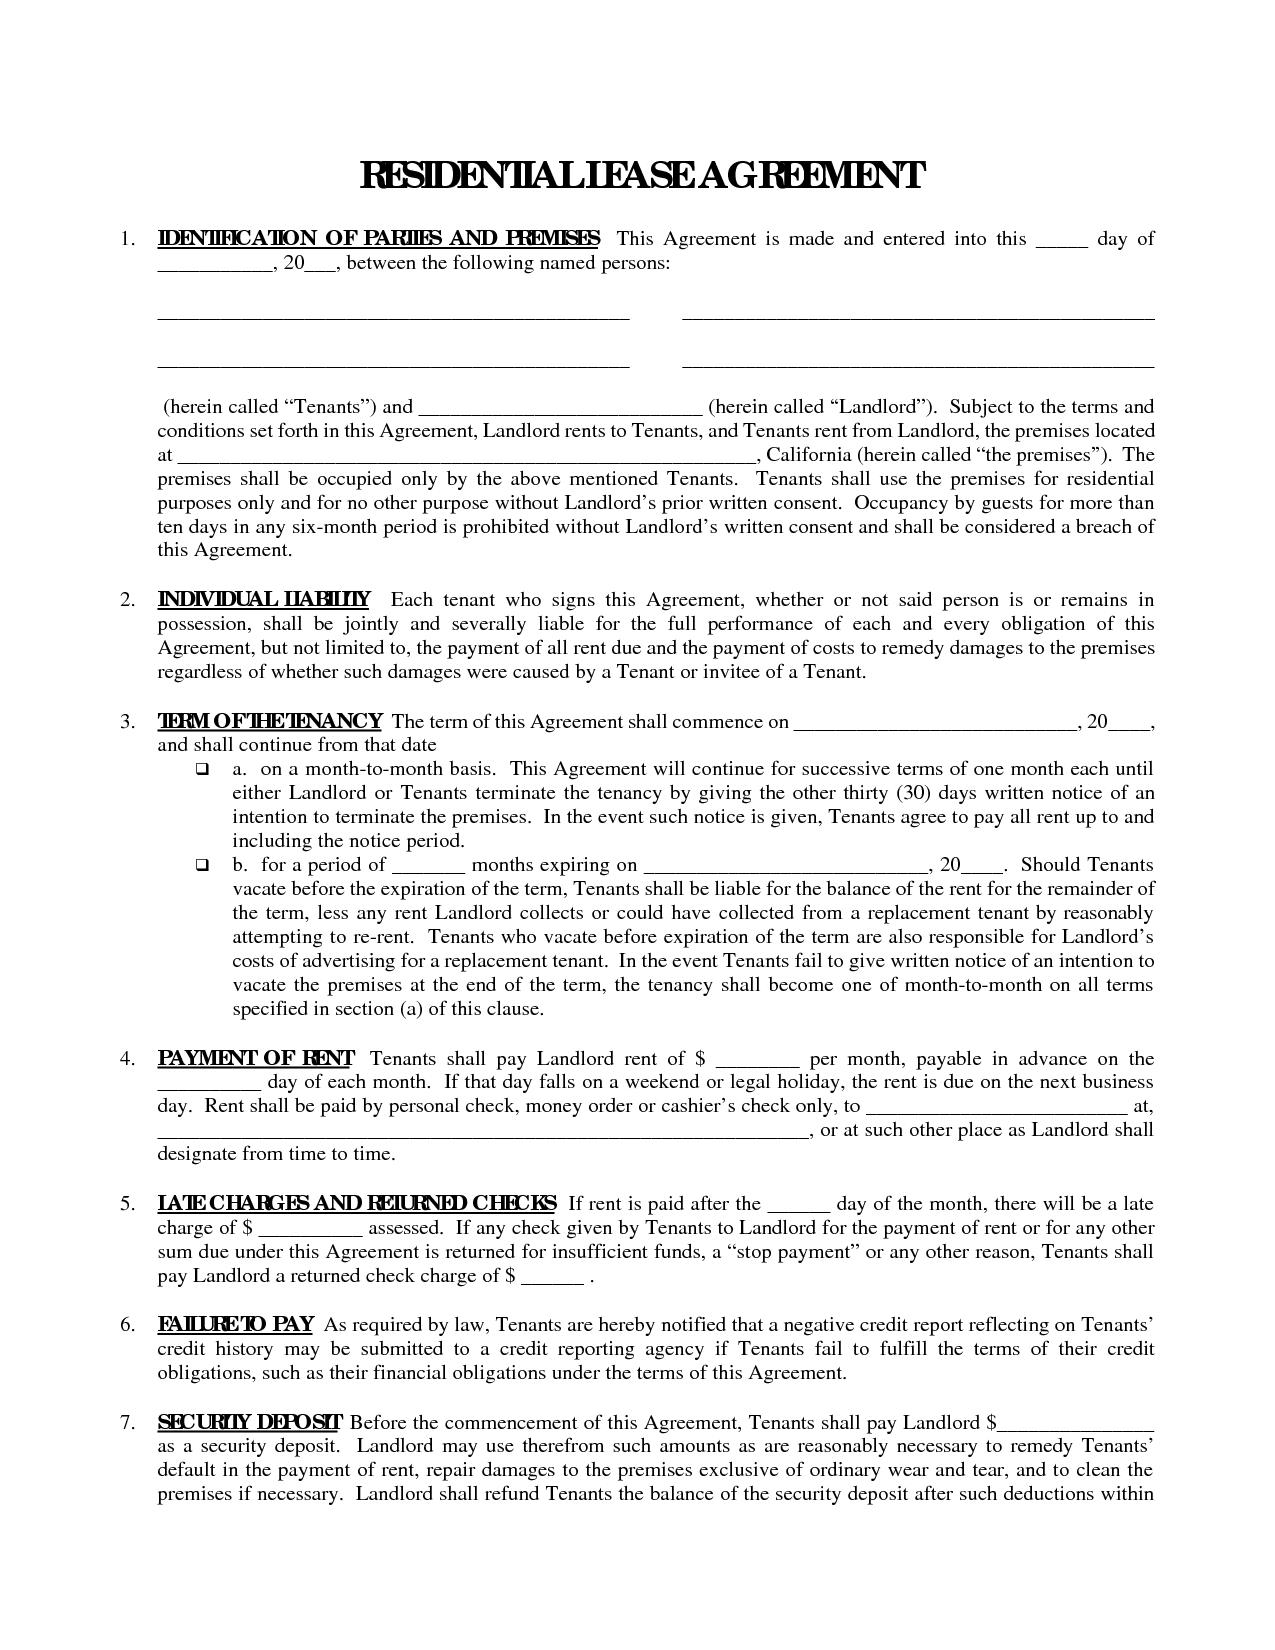 Printable Residential Free House Lease Agreement   Residential Lease - Apartment Lease Agreement Free Printable